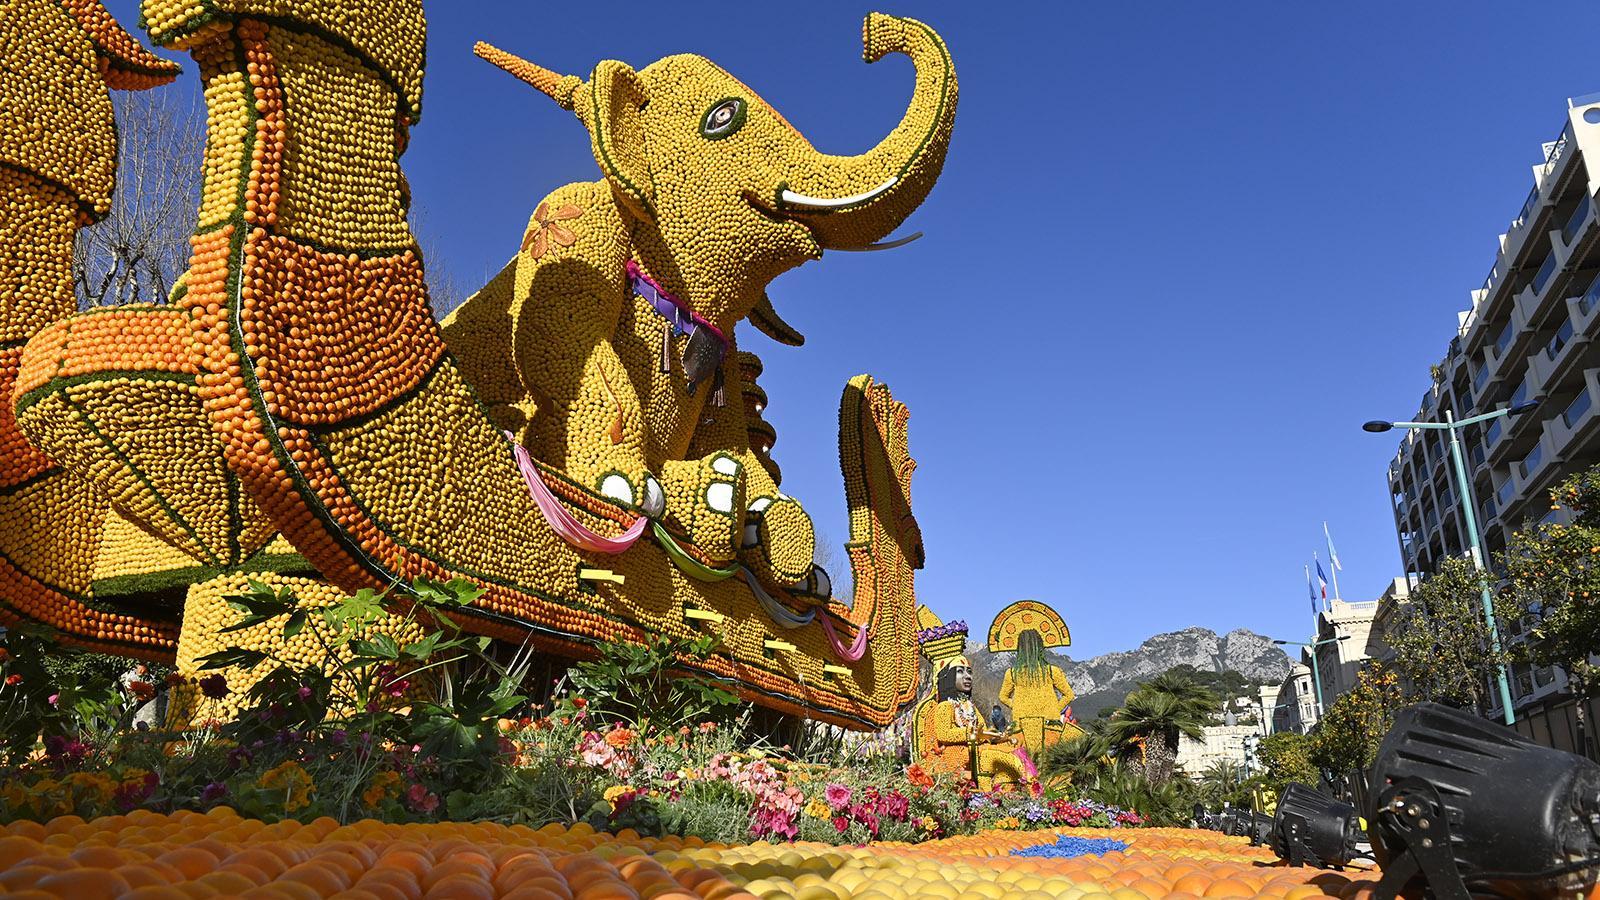 Fête du Citron: Der Elefant hockt auf einem Wasserfall-Sockel. Foto: Hilke Maunder